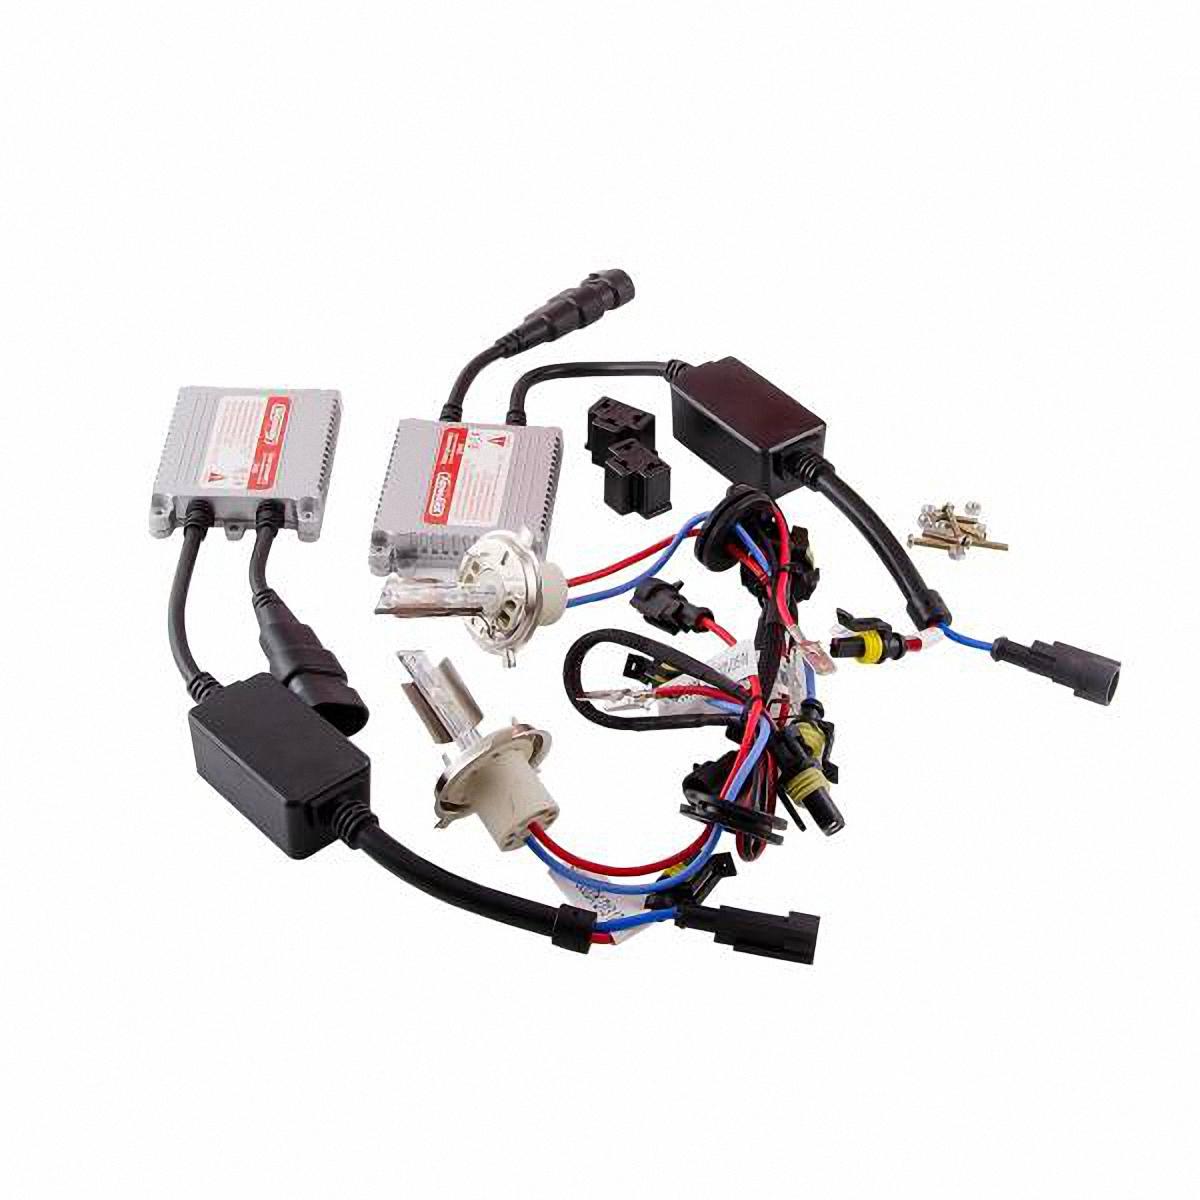 Skyway Автолампа ксенон H4. SH4 4300K D13 12V35WSH4 4300K D13 12V35WКомплектация: Лампа газоразрядная ксеноновая – 2 шт. Блок розжига – 2 шт. Винты для блока розжига – 6 шт. Гарантийный талон – 1 шт. Инструкция - 1 шт.